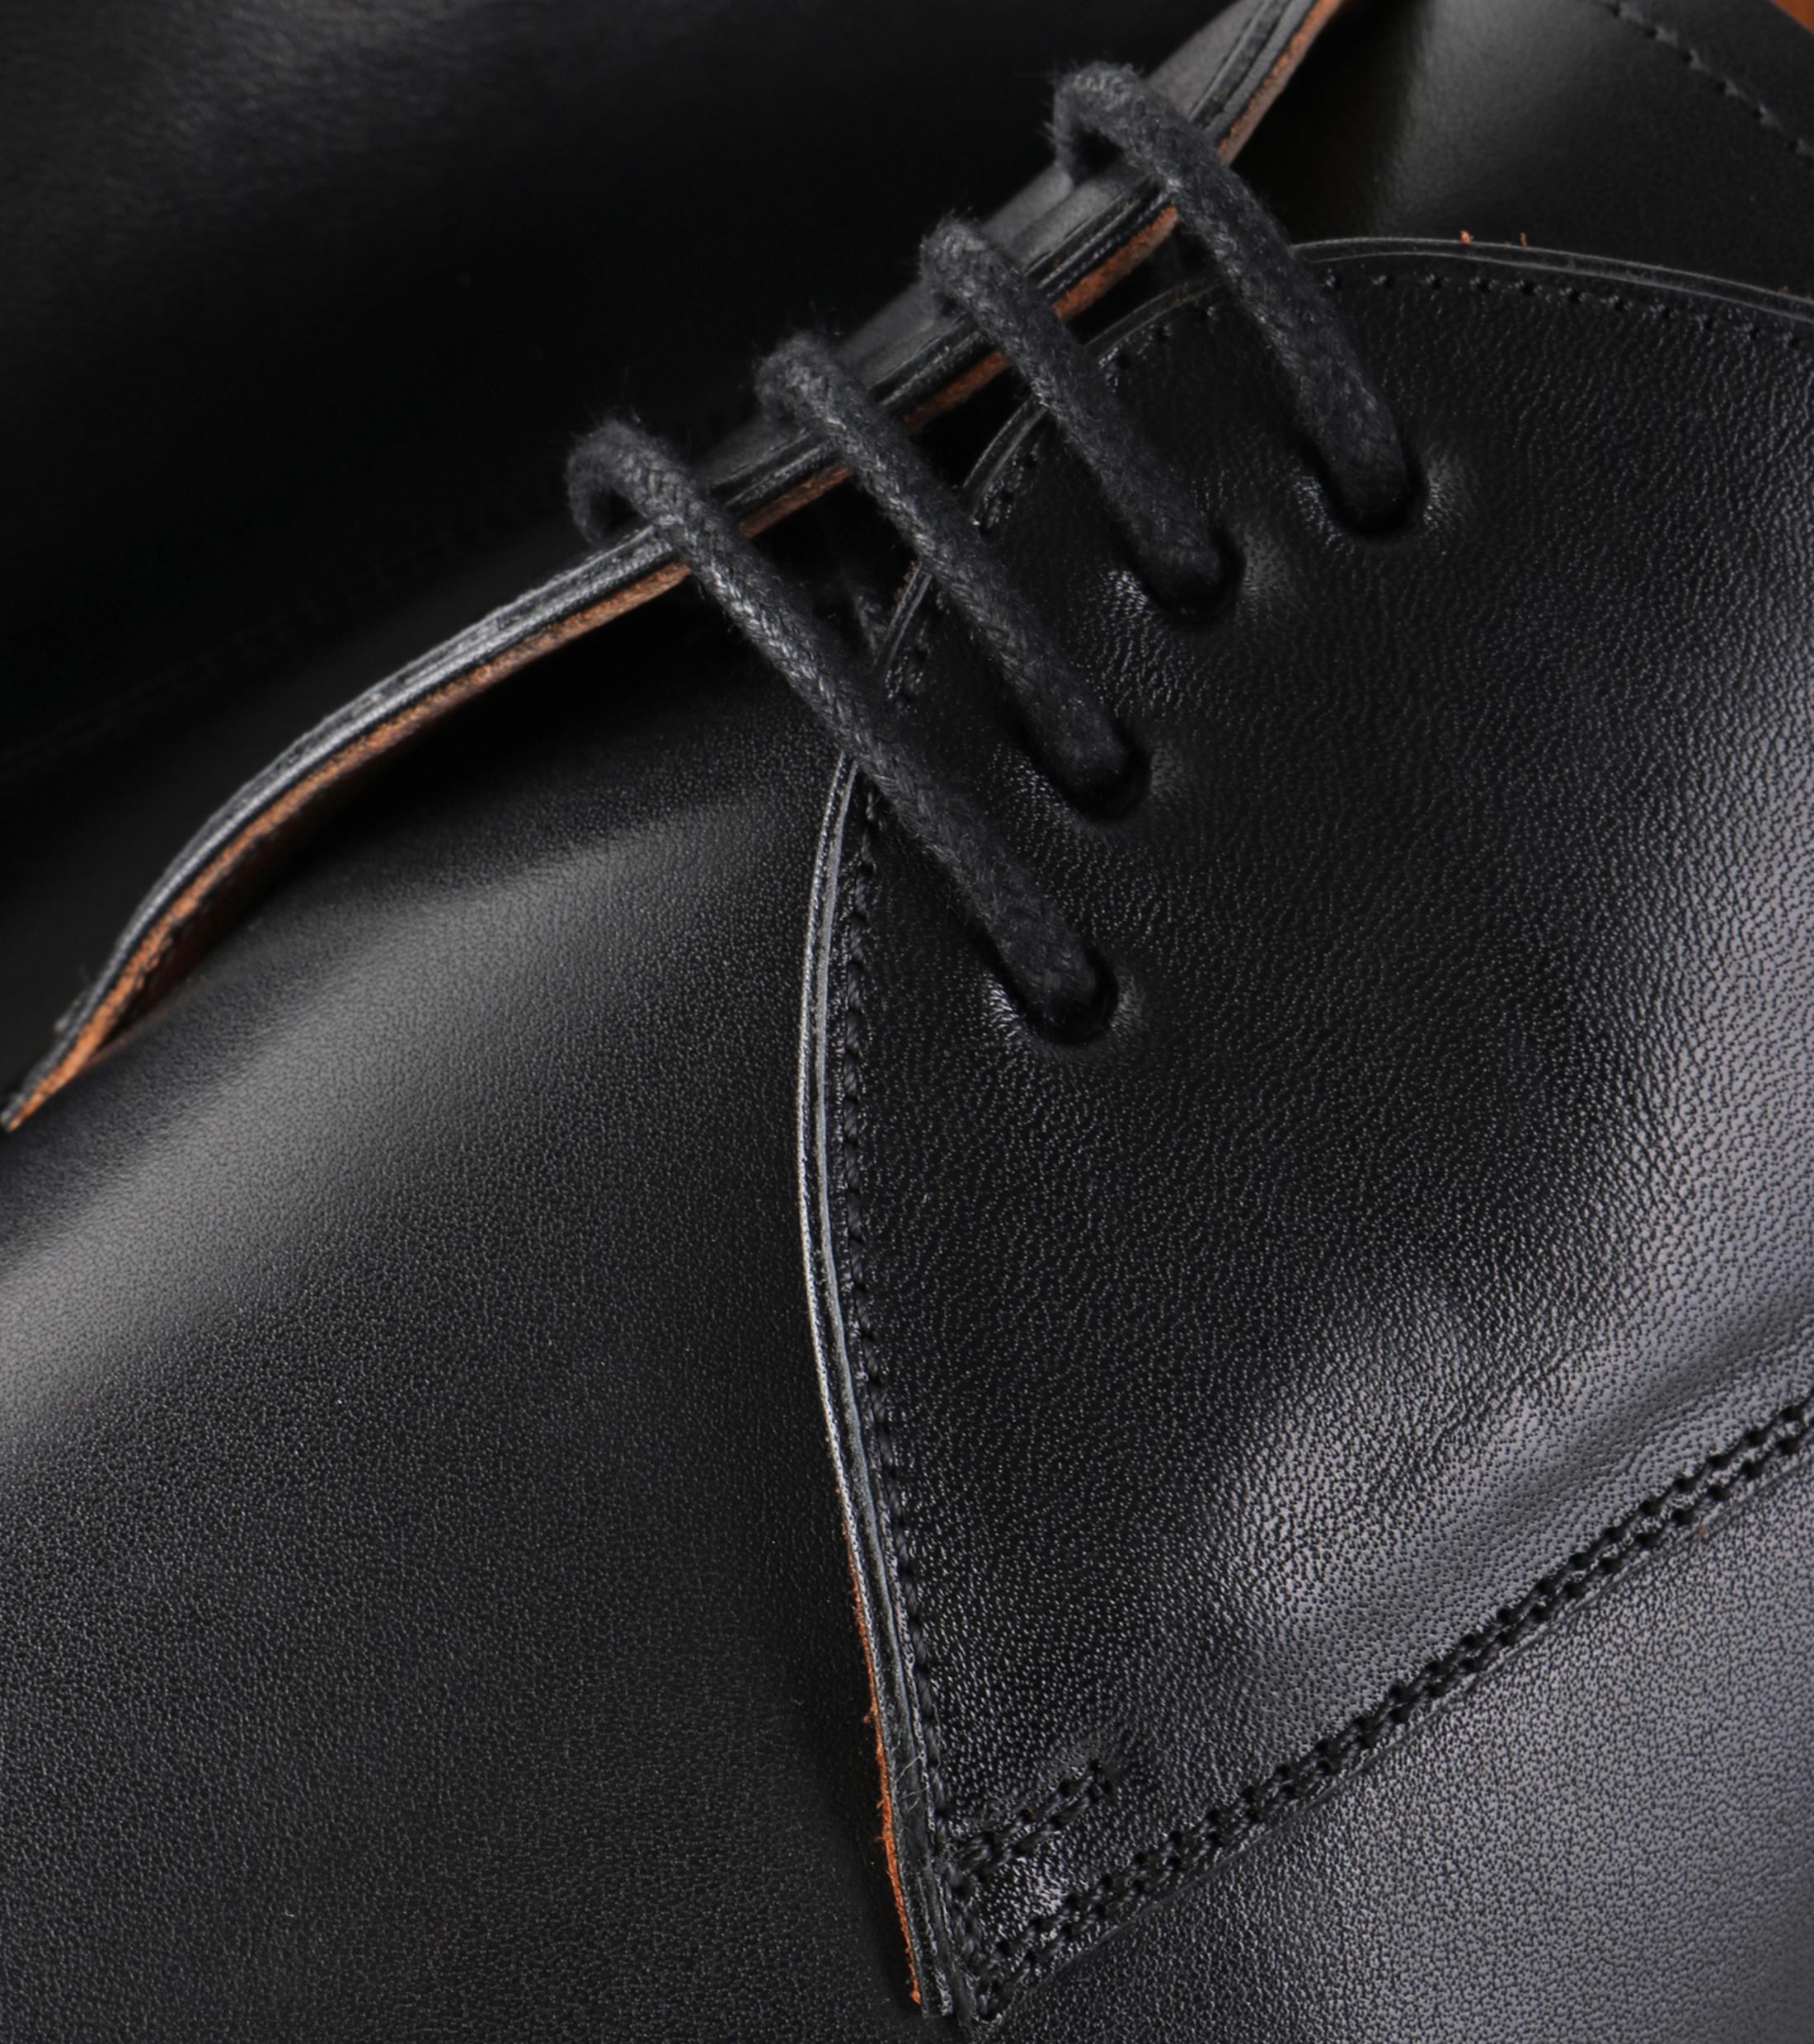 Chaussures Hommes Stbl En Cuir De Luxe Noir sAO9vHgI